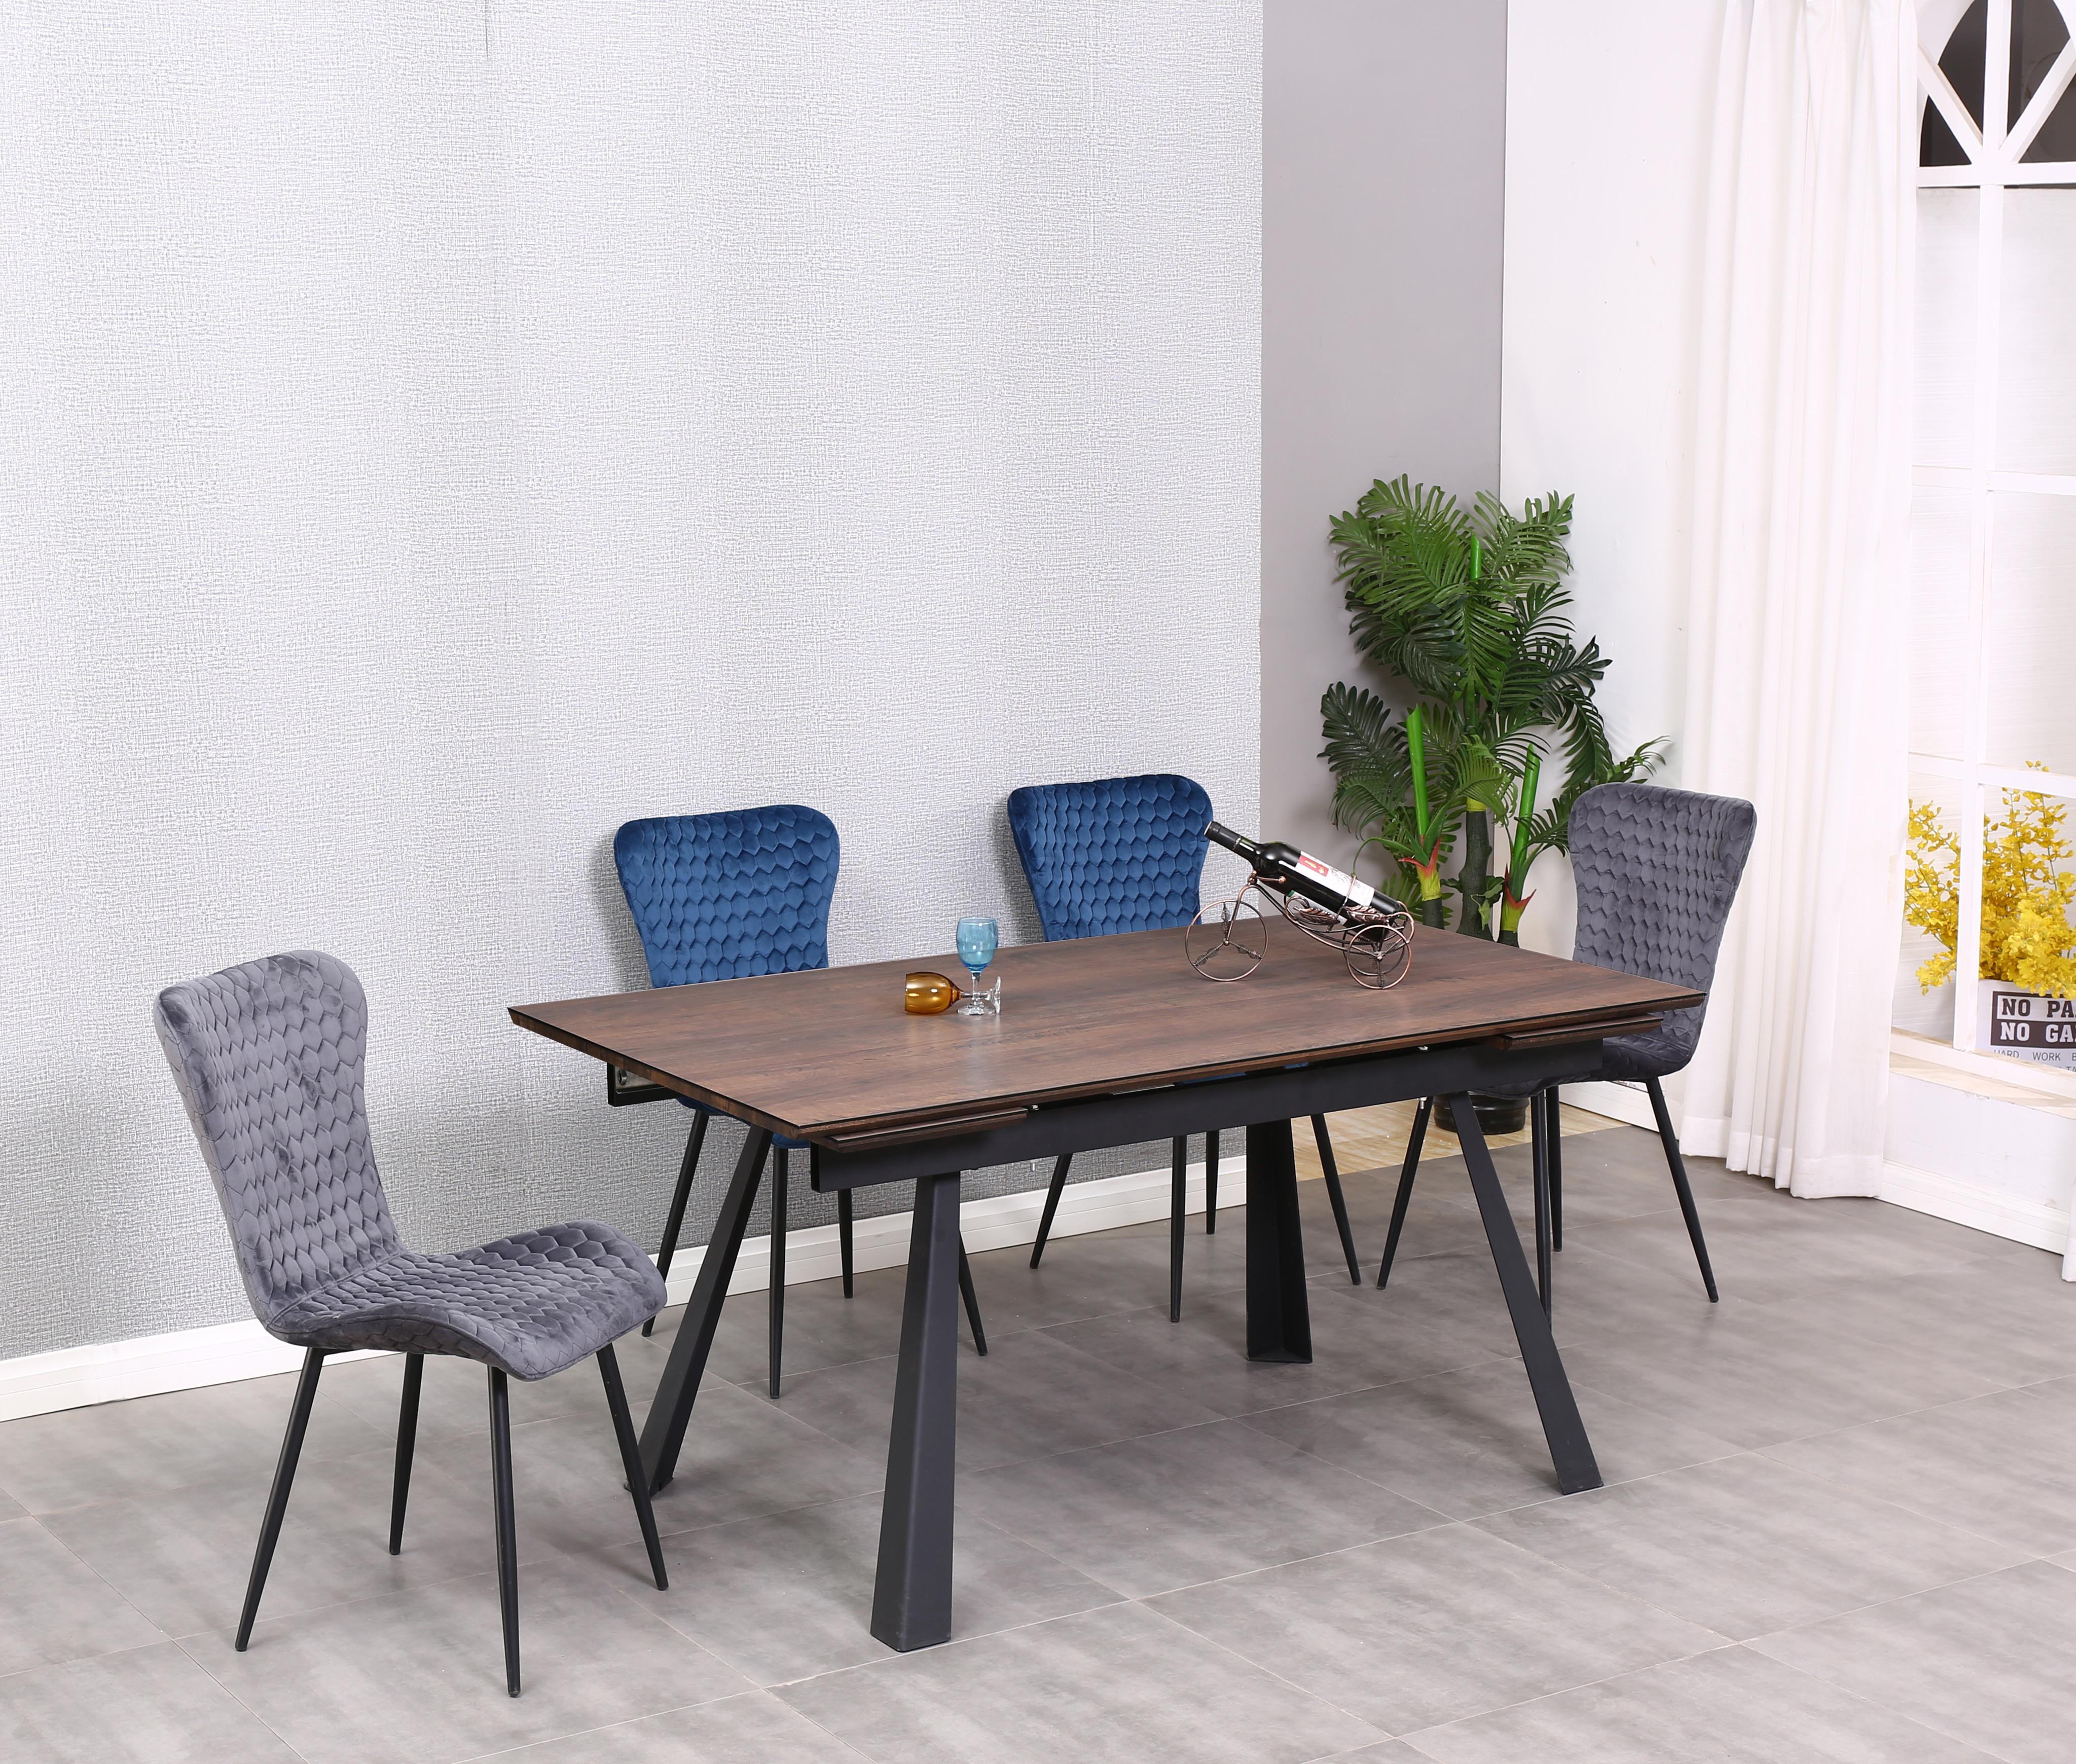 New Design Ceramic Glass Marble Top Dining Table Extendable Dining Table Buy Ceramic Dining Table Extendable Dining Table Marble Table Product On Alibaba Com